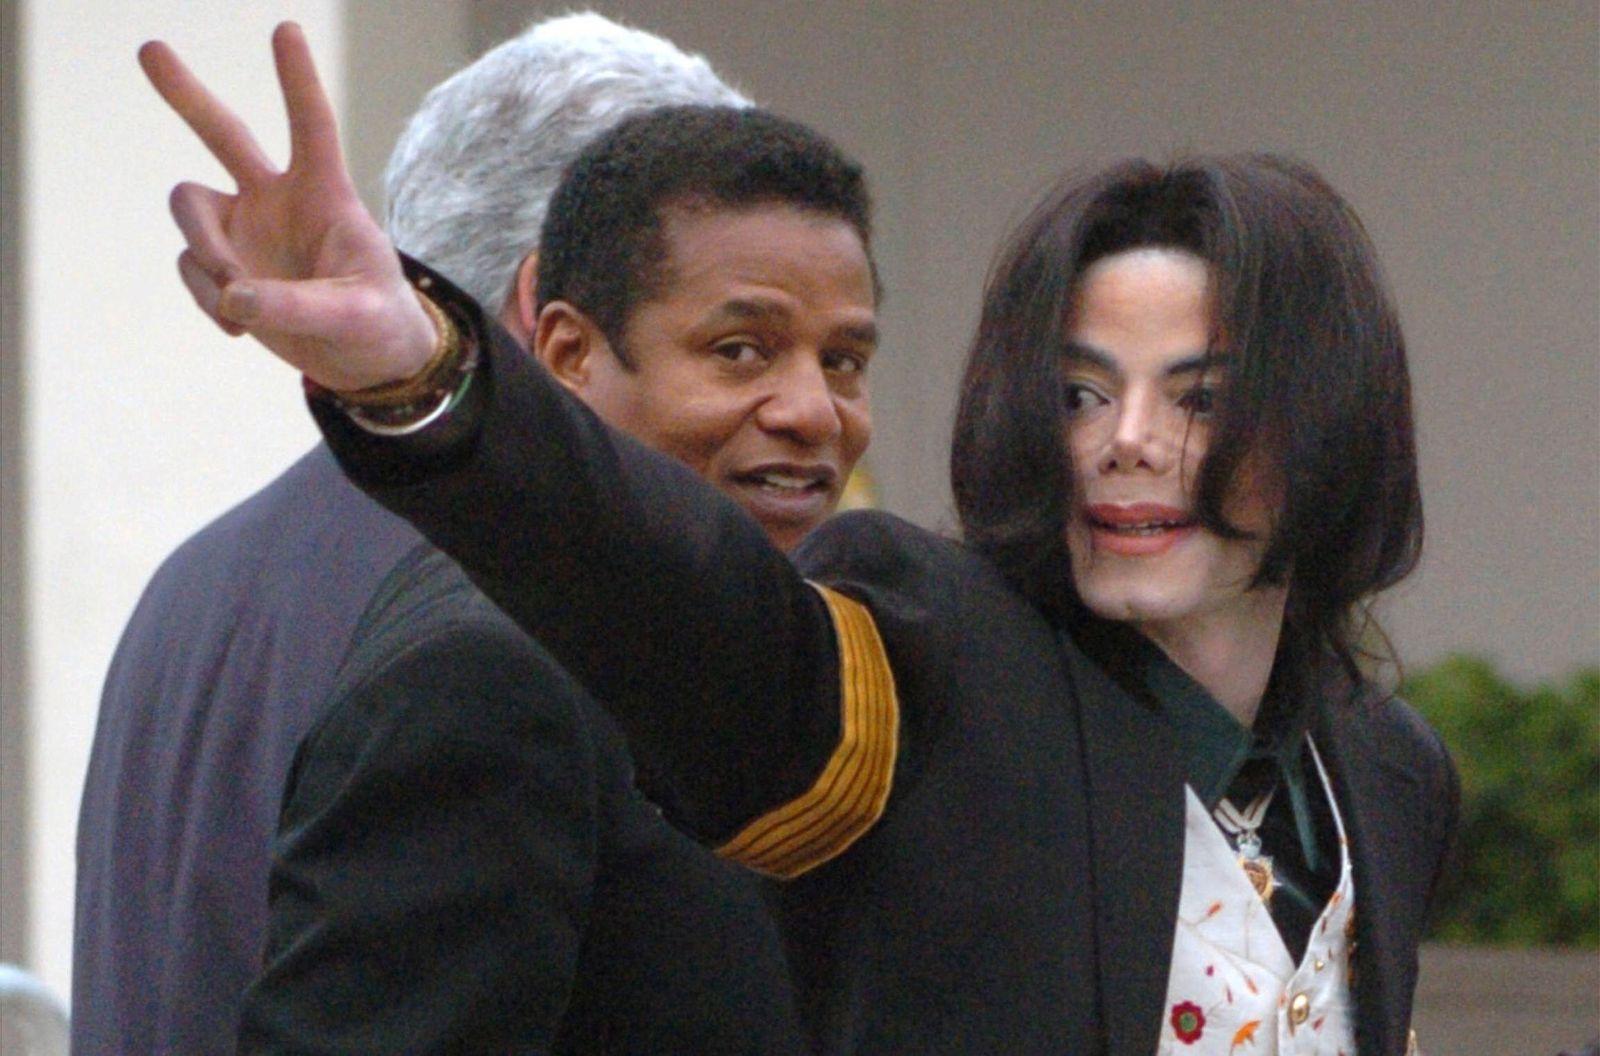 Mar 03 2005 Santa Maria CA USA MICHAEL JACKSON Michael Jackson gives peace or victory sign as h